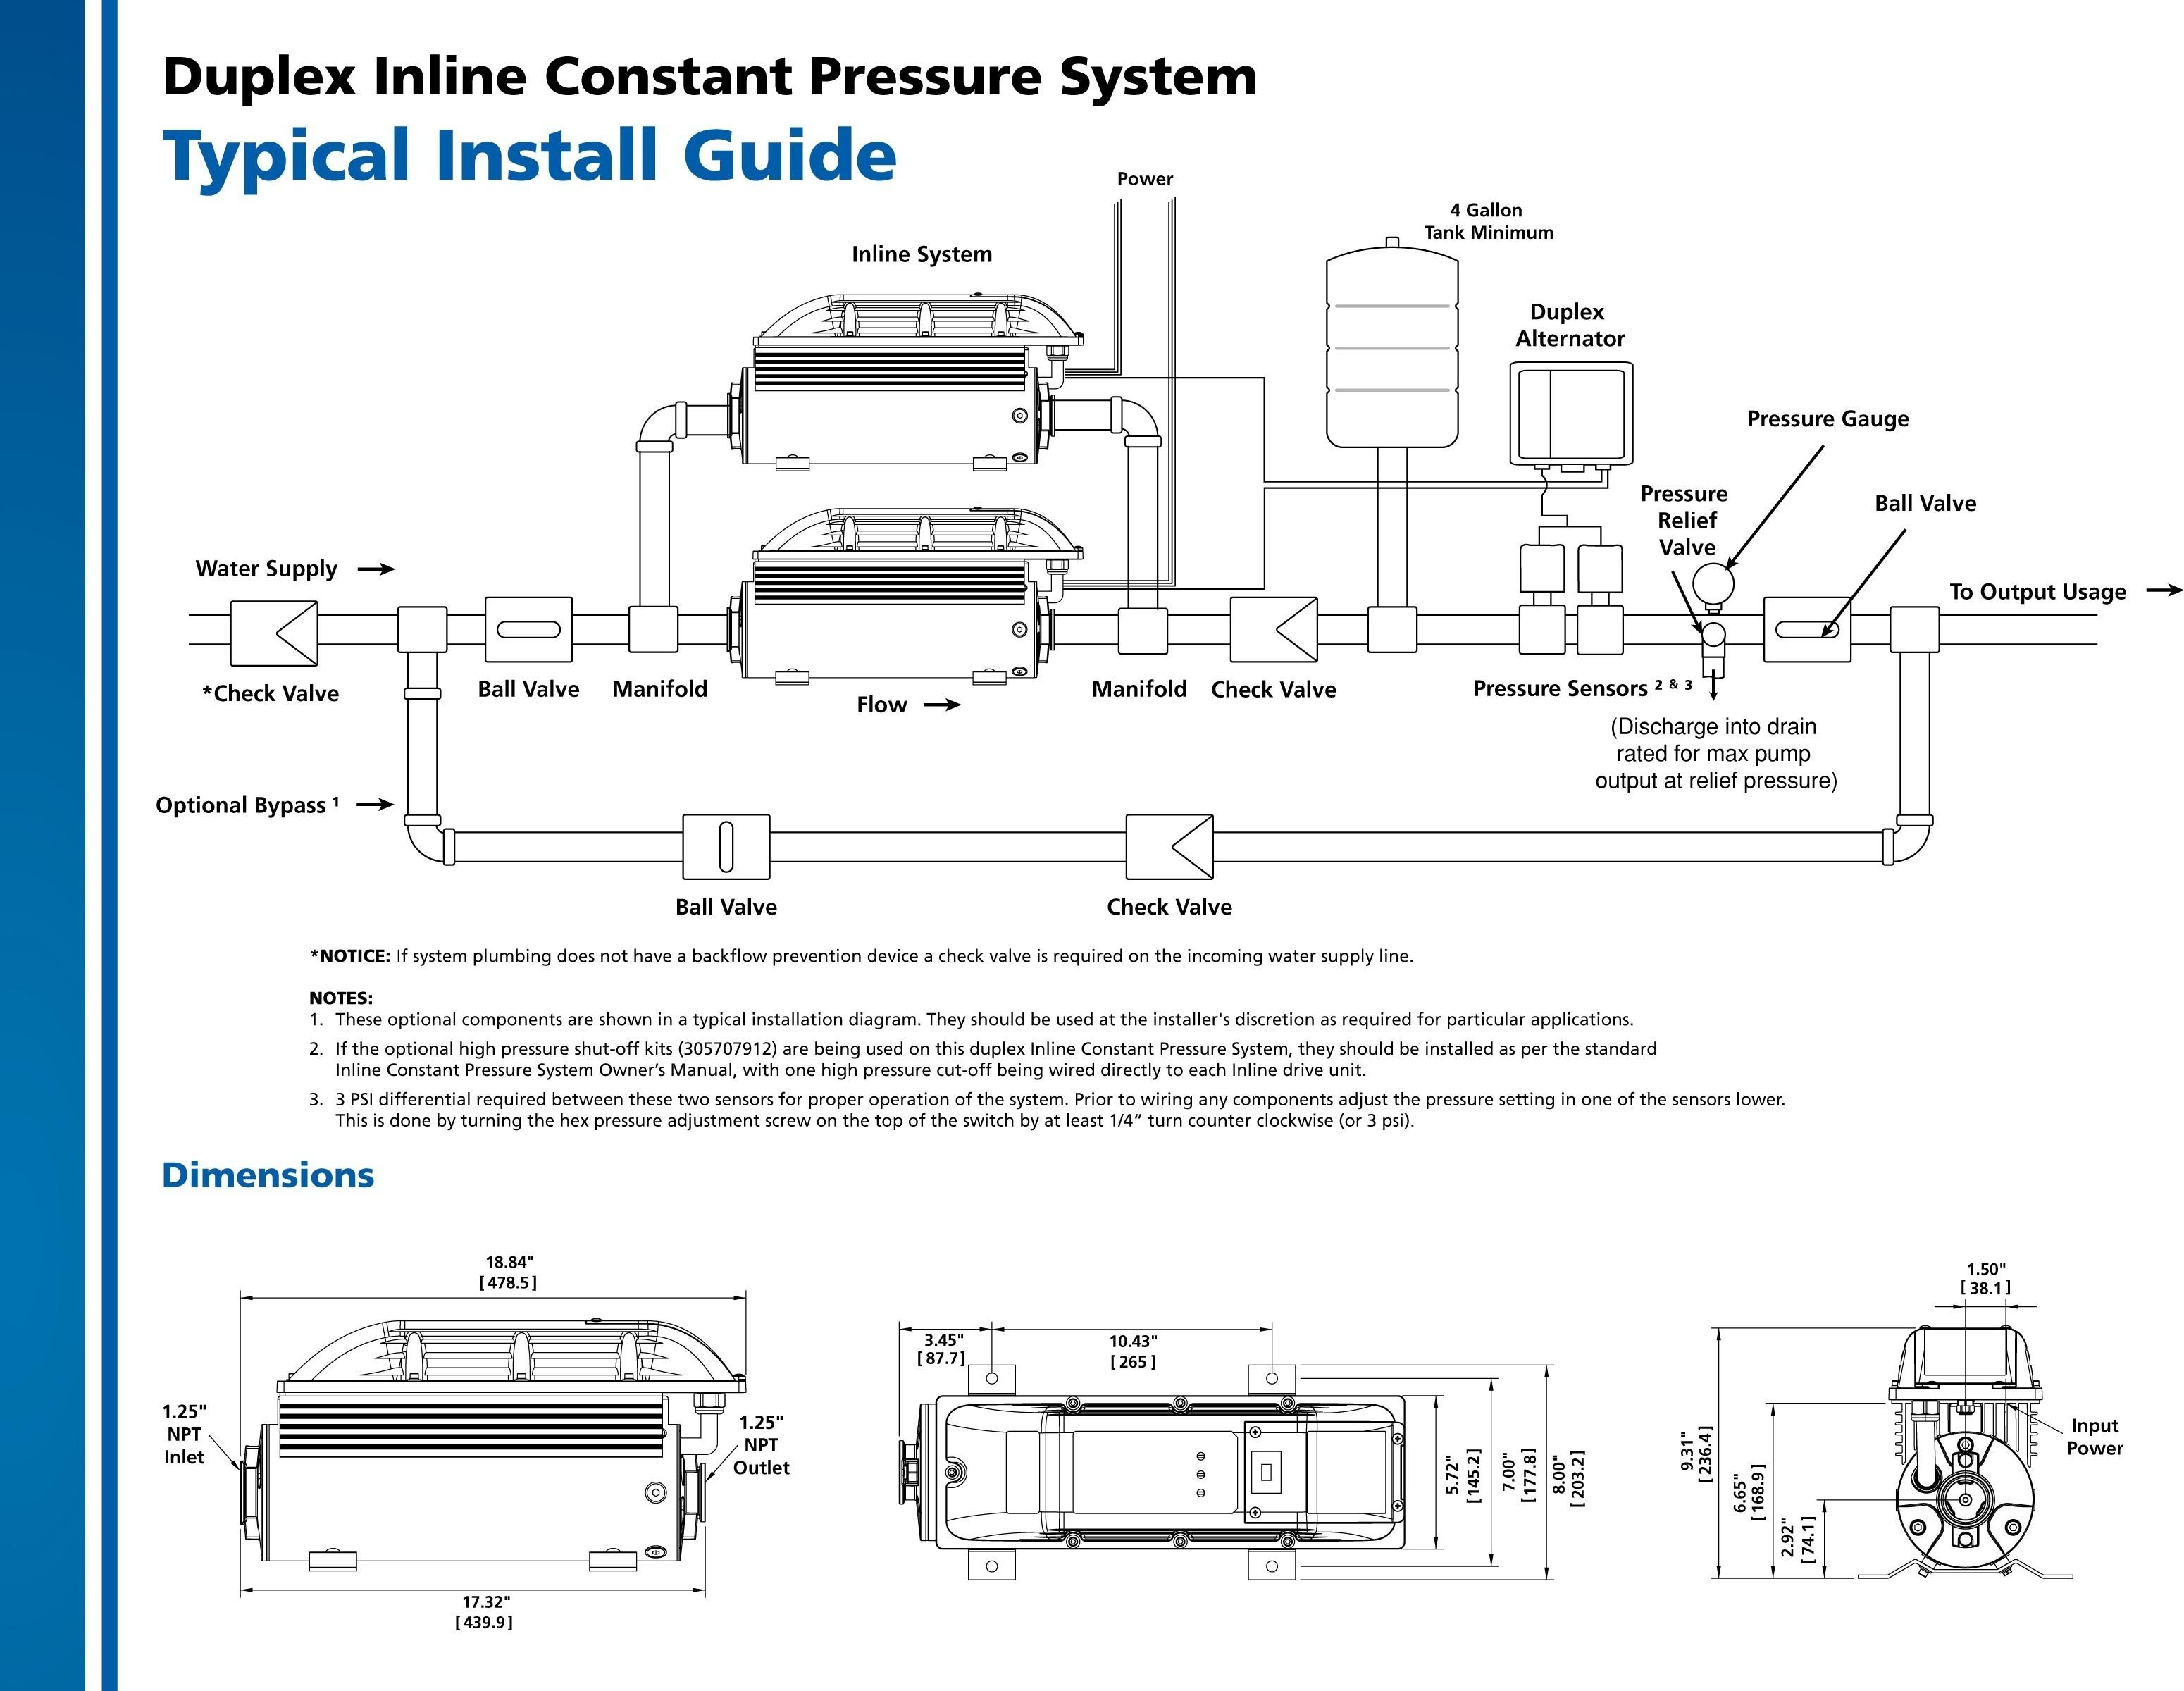 grundfos circulating pump wiring diagram - grundfos pump wiring diagram wire  center u2022 rh flrishfarm co